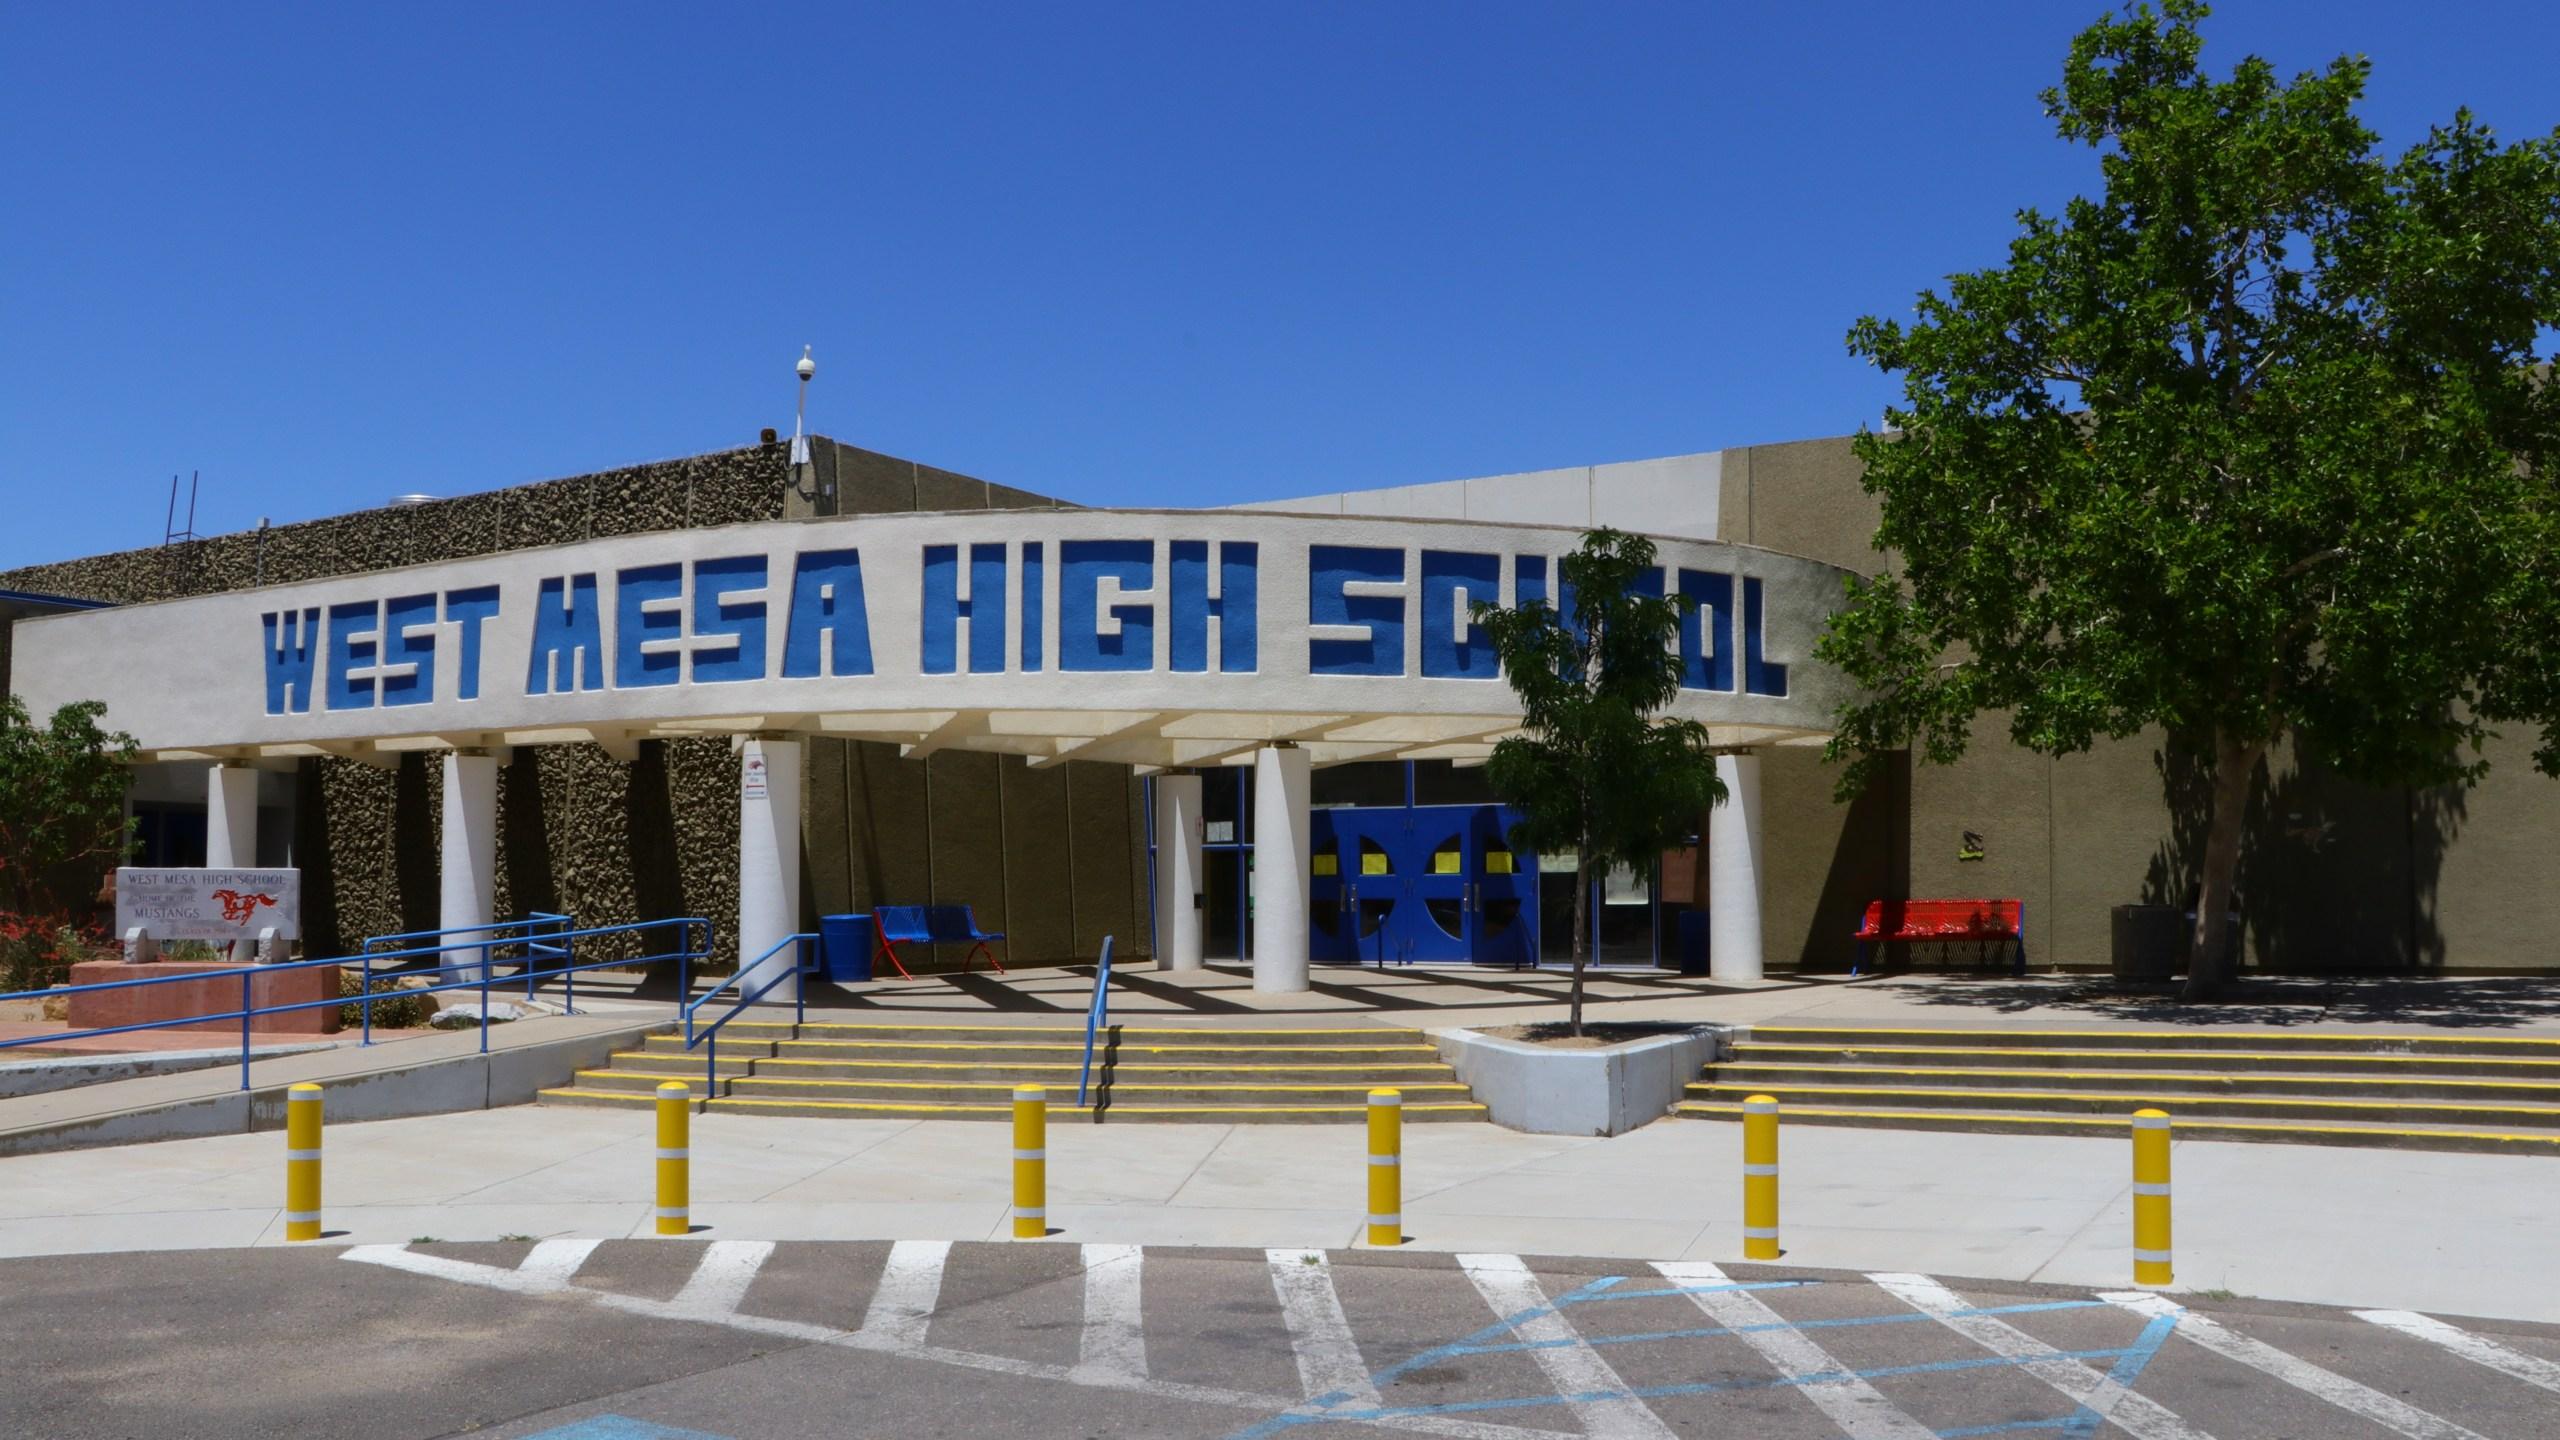 stockimg - West Mesa High School